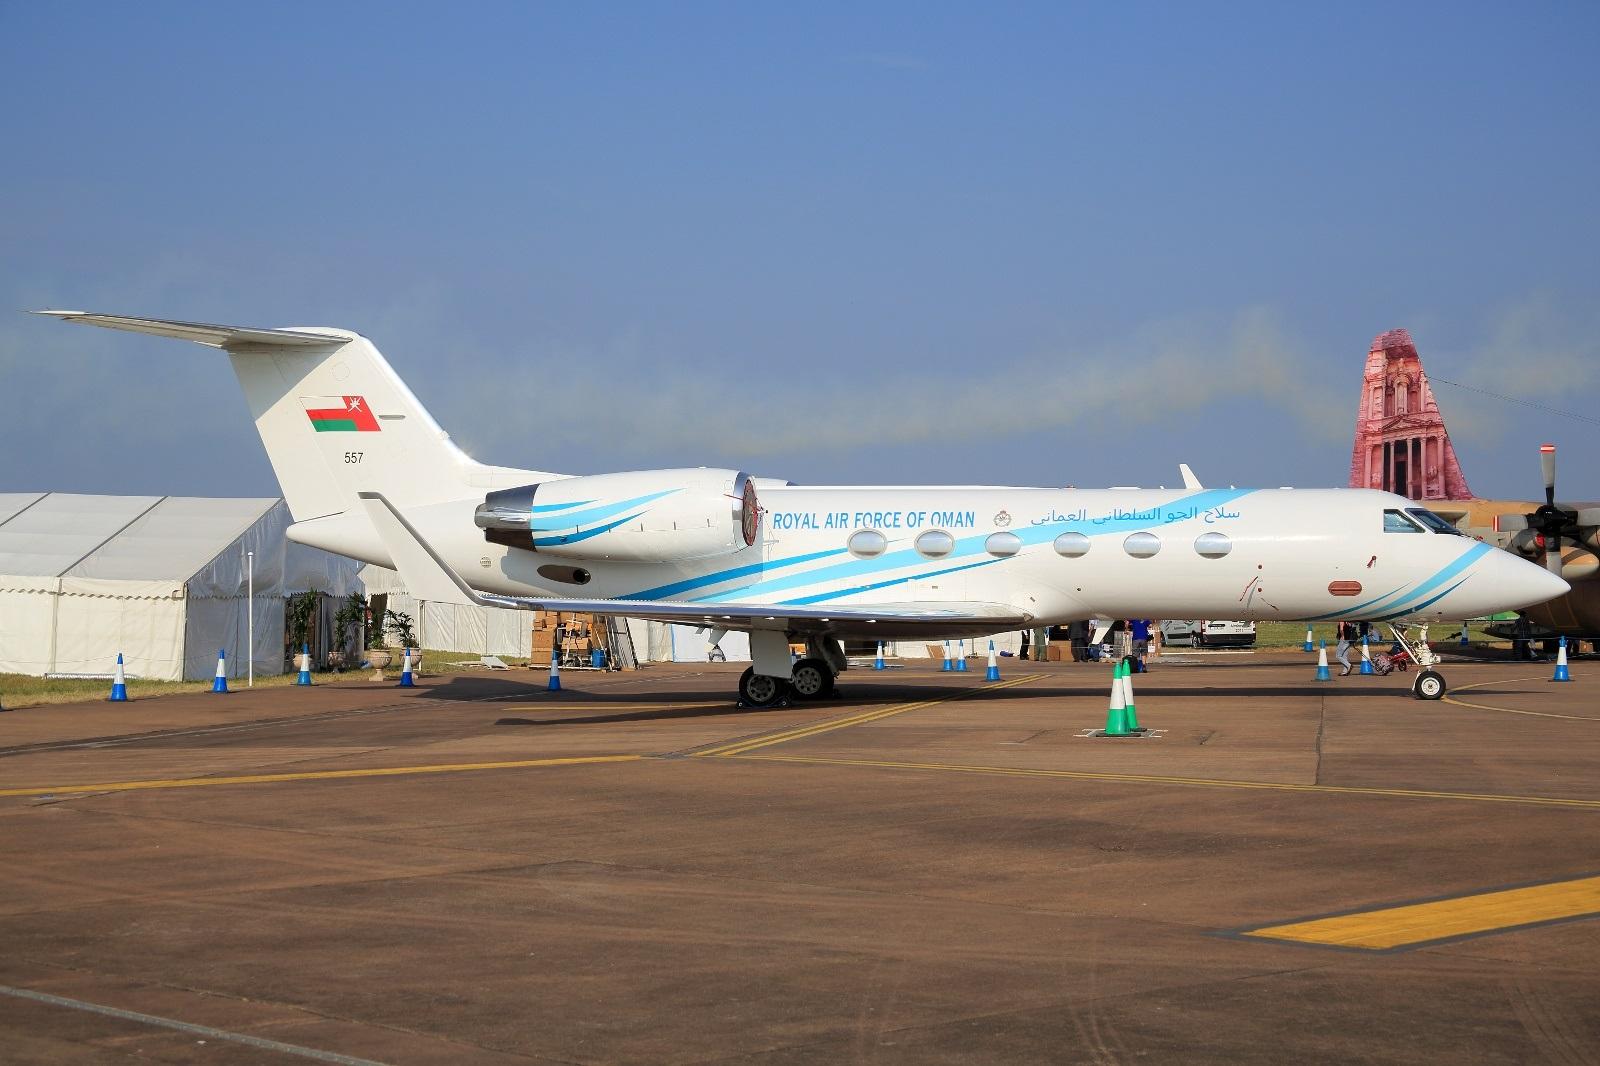 557-royal-air-force-of-oman-rafo-gulfstream-aerospace-g-iv-gulfstream-iv_PlanespottersNet_434702.jpg